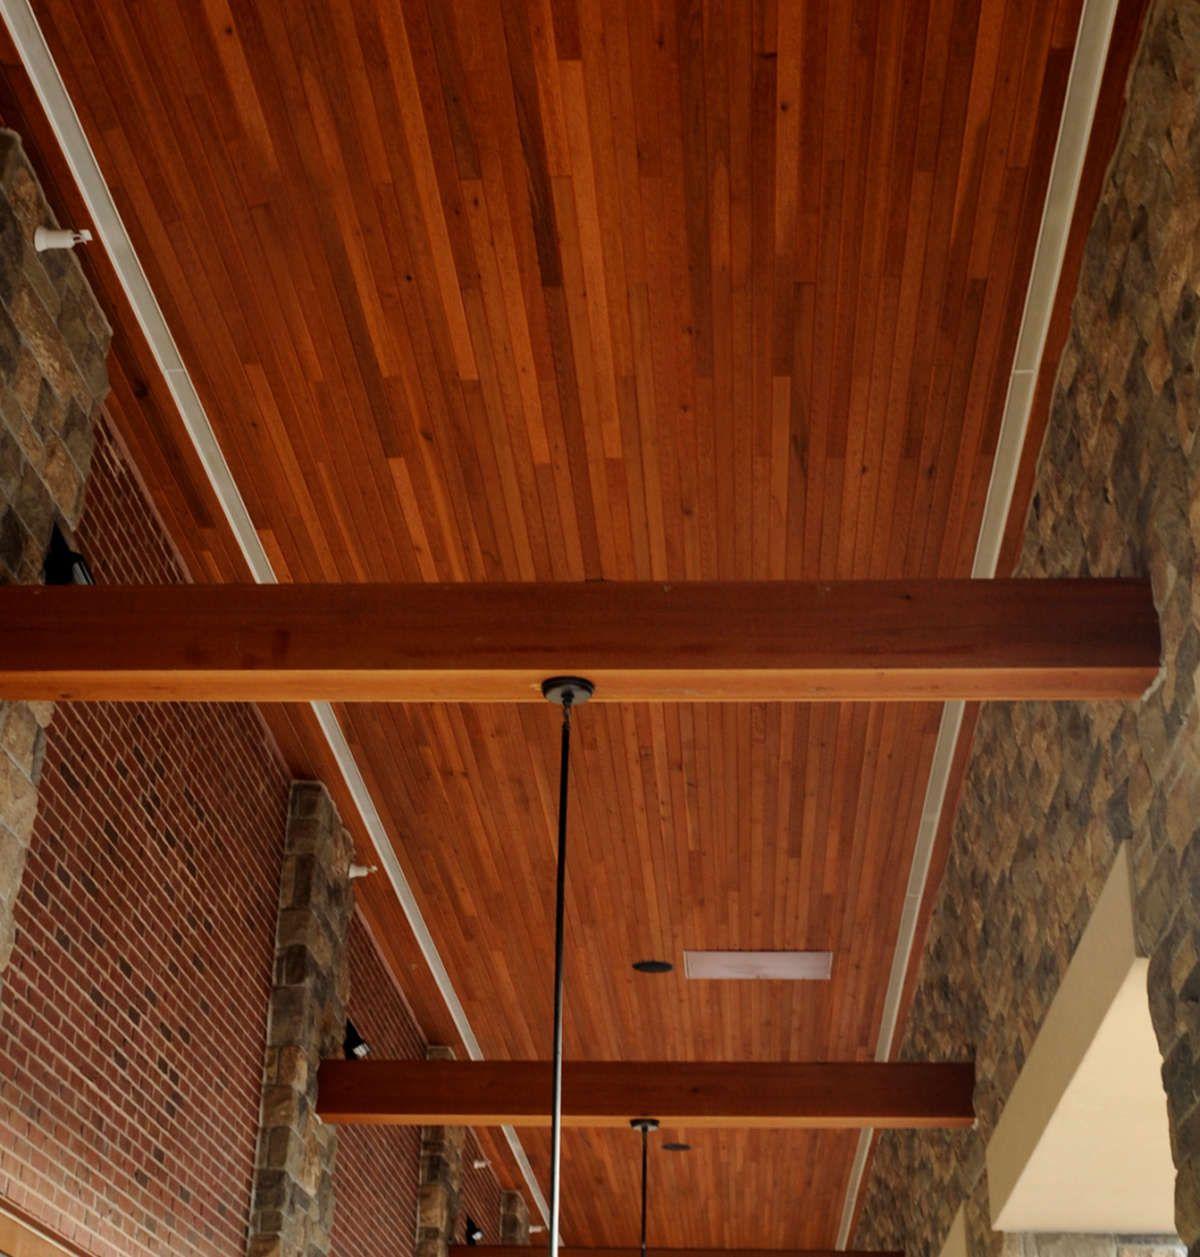 1x4 Tu0026G Cedar Ceiling Soffit With Large Cedar Beam Accents